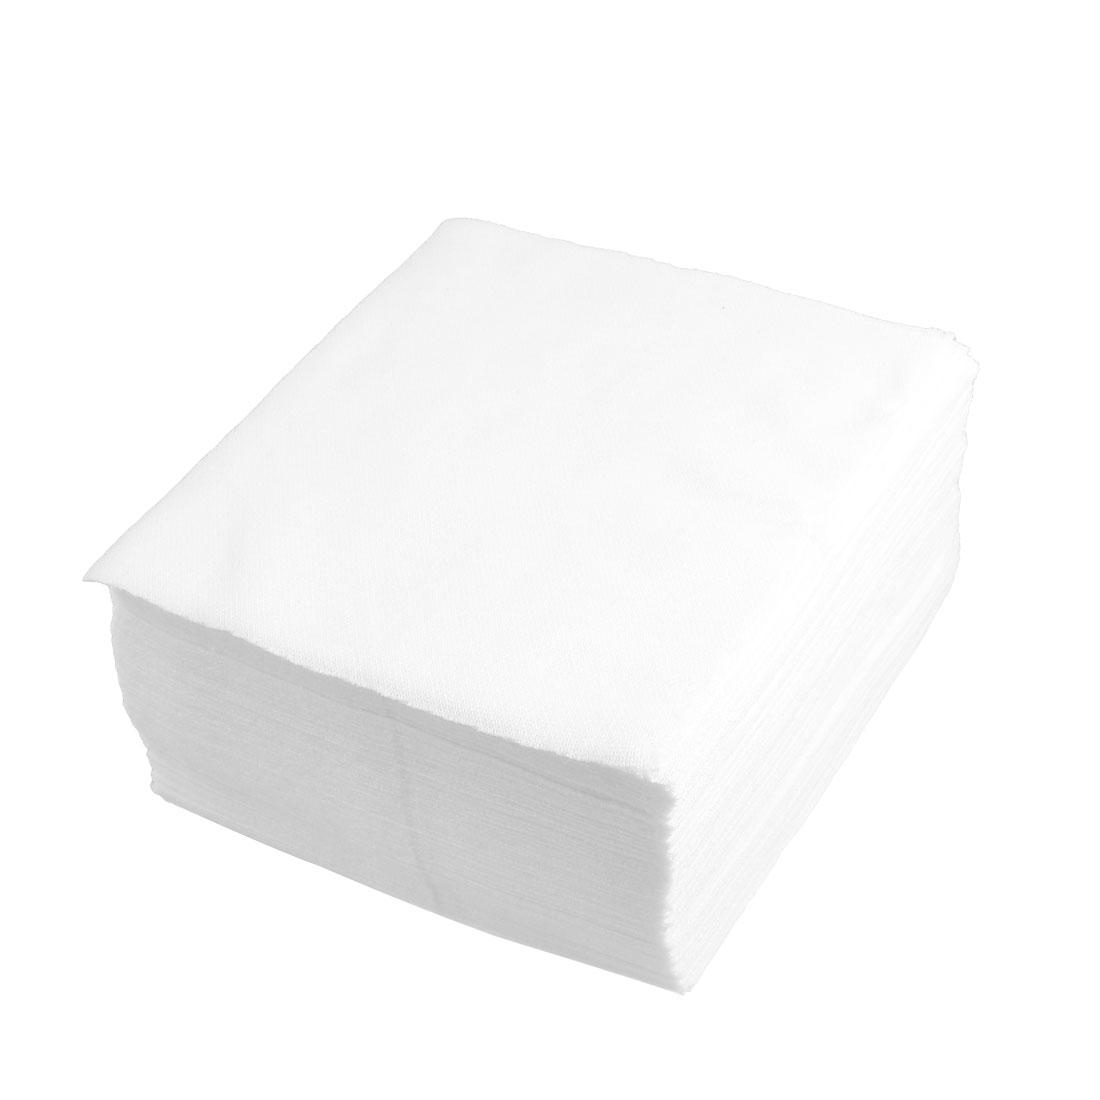 "150 Pcs 6"" x 6"" Cleanroom Wiper Dustless Cloth IC PCB Cleaner"